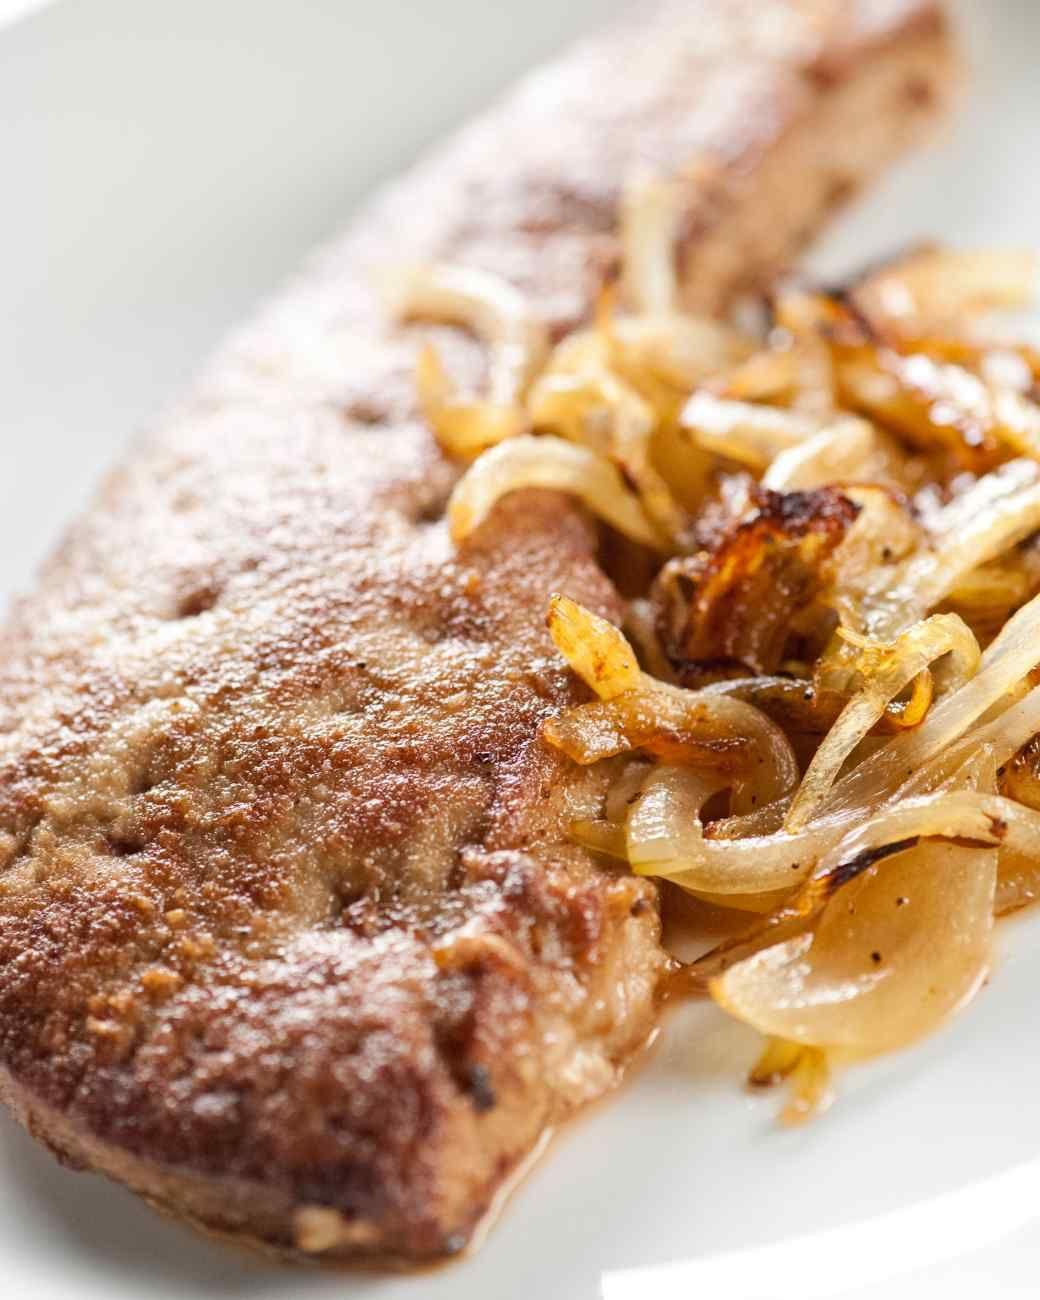 Sauteed Calf's Liver Recipe Cooking Ideas & Recipes